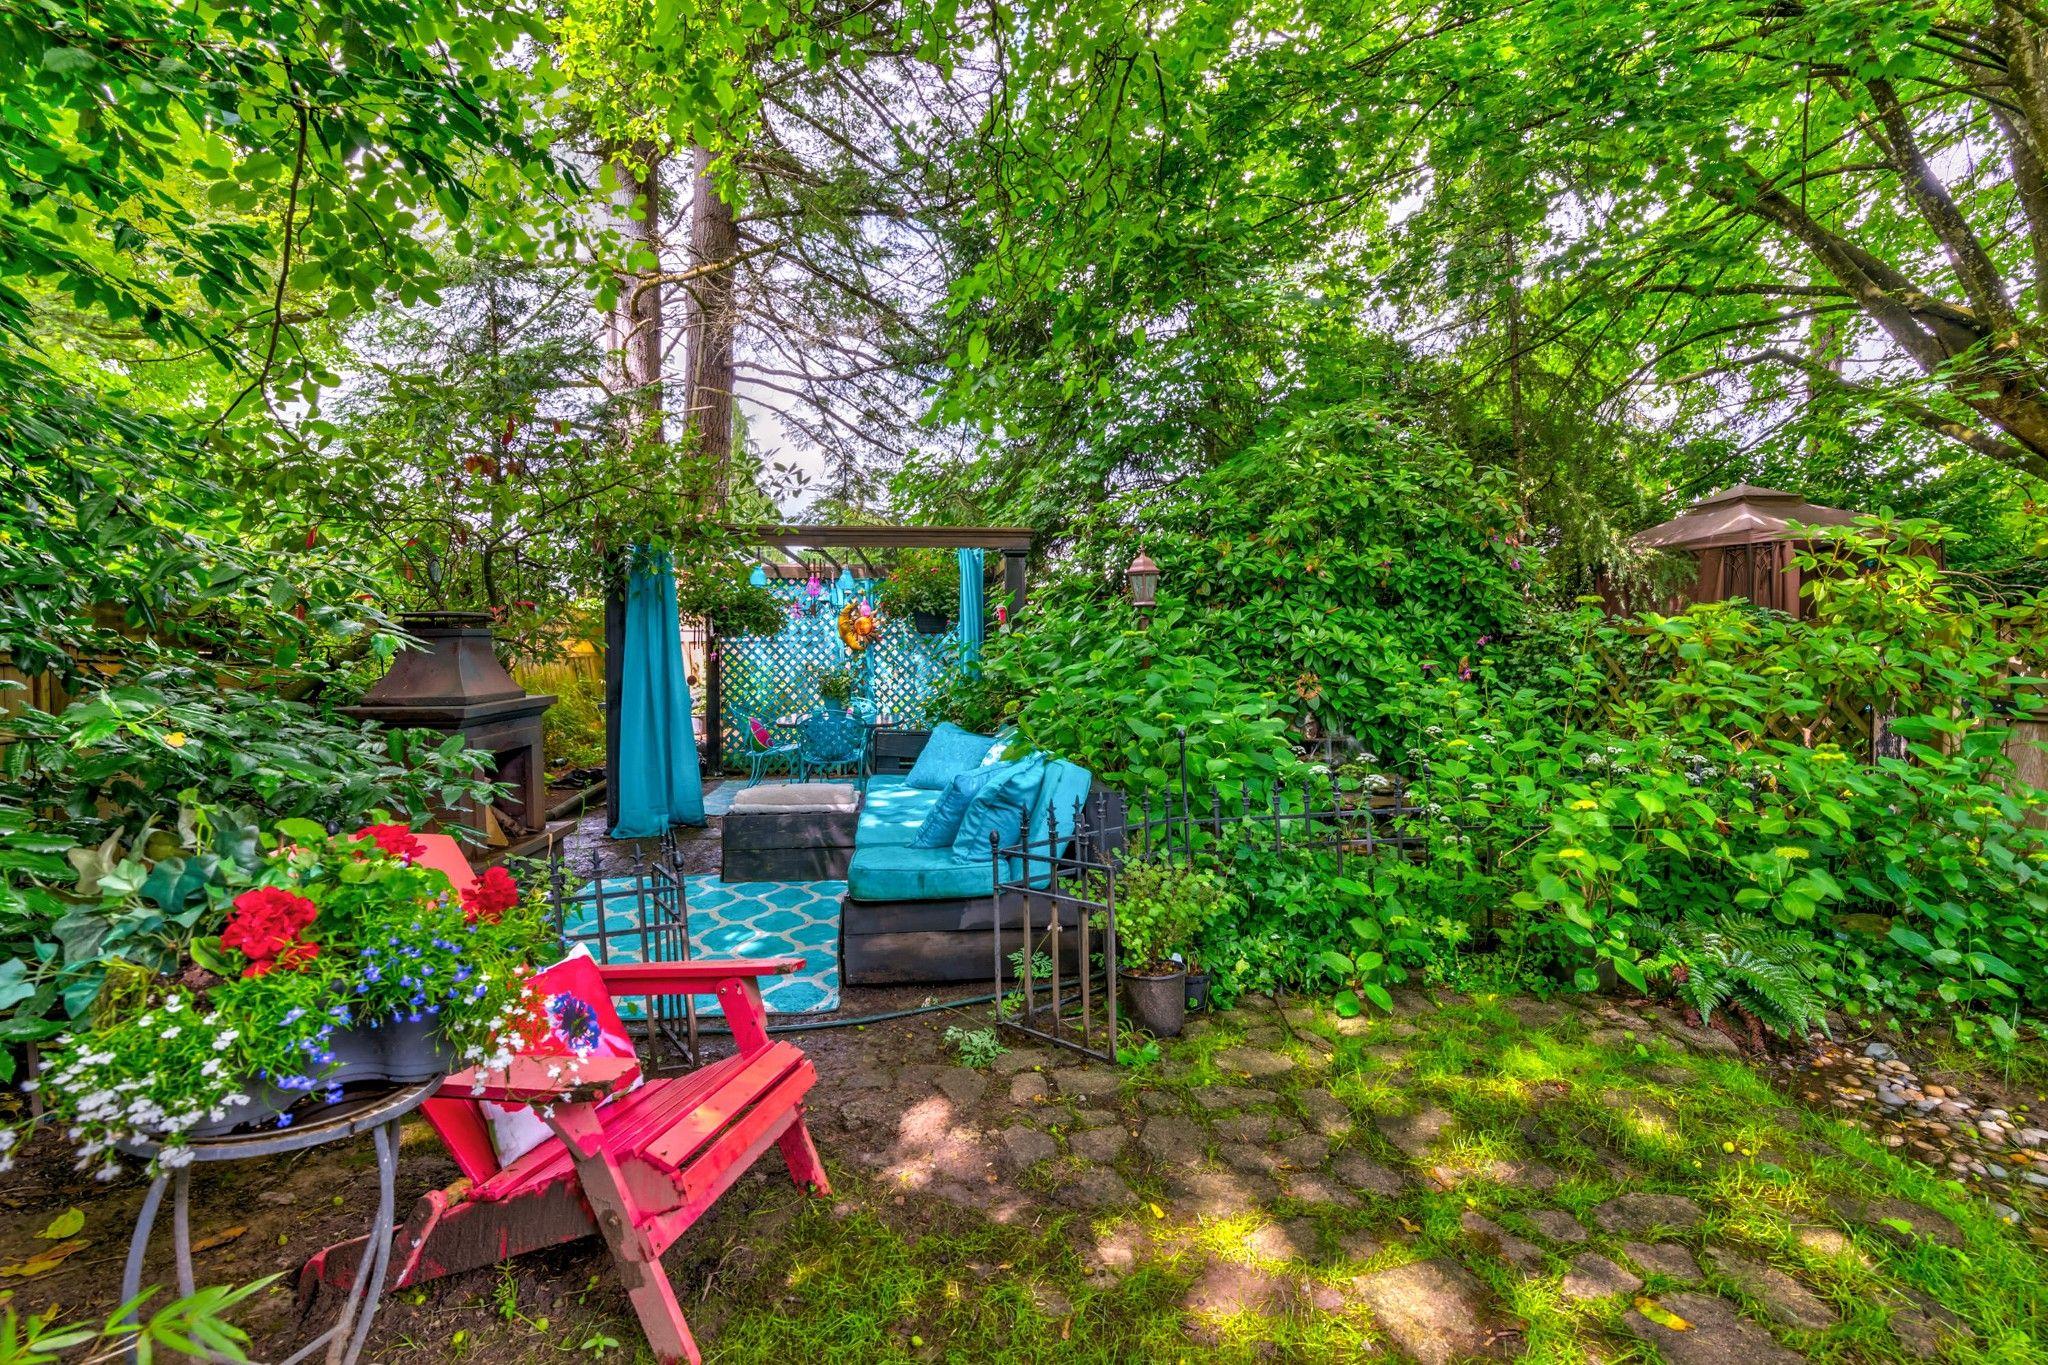 Photo 25: Photos: 20623 114 Avenue in Maple Ridge: Southwest Maple Ridge House for sale : MLS®# R2465656